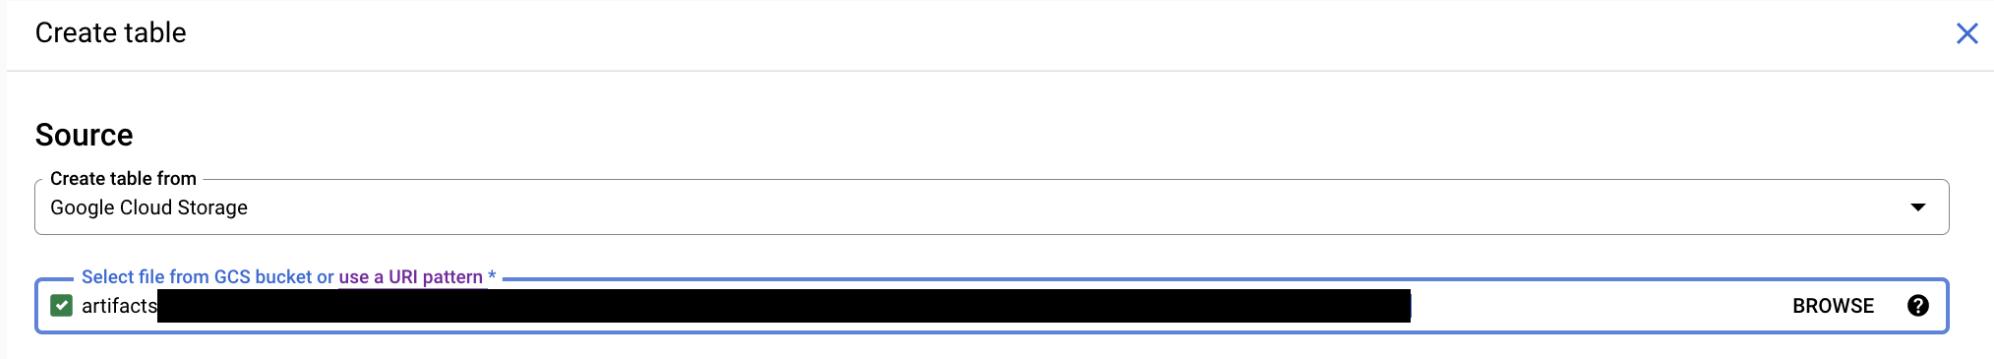 Select file